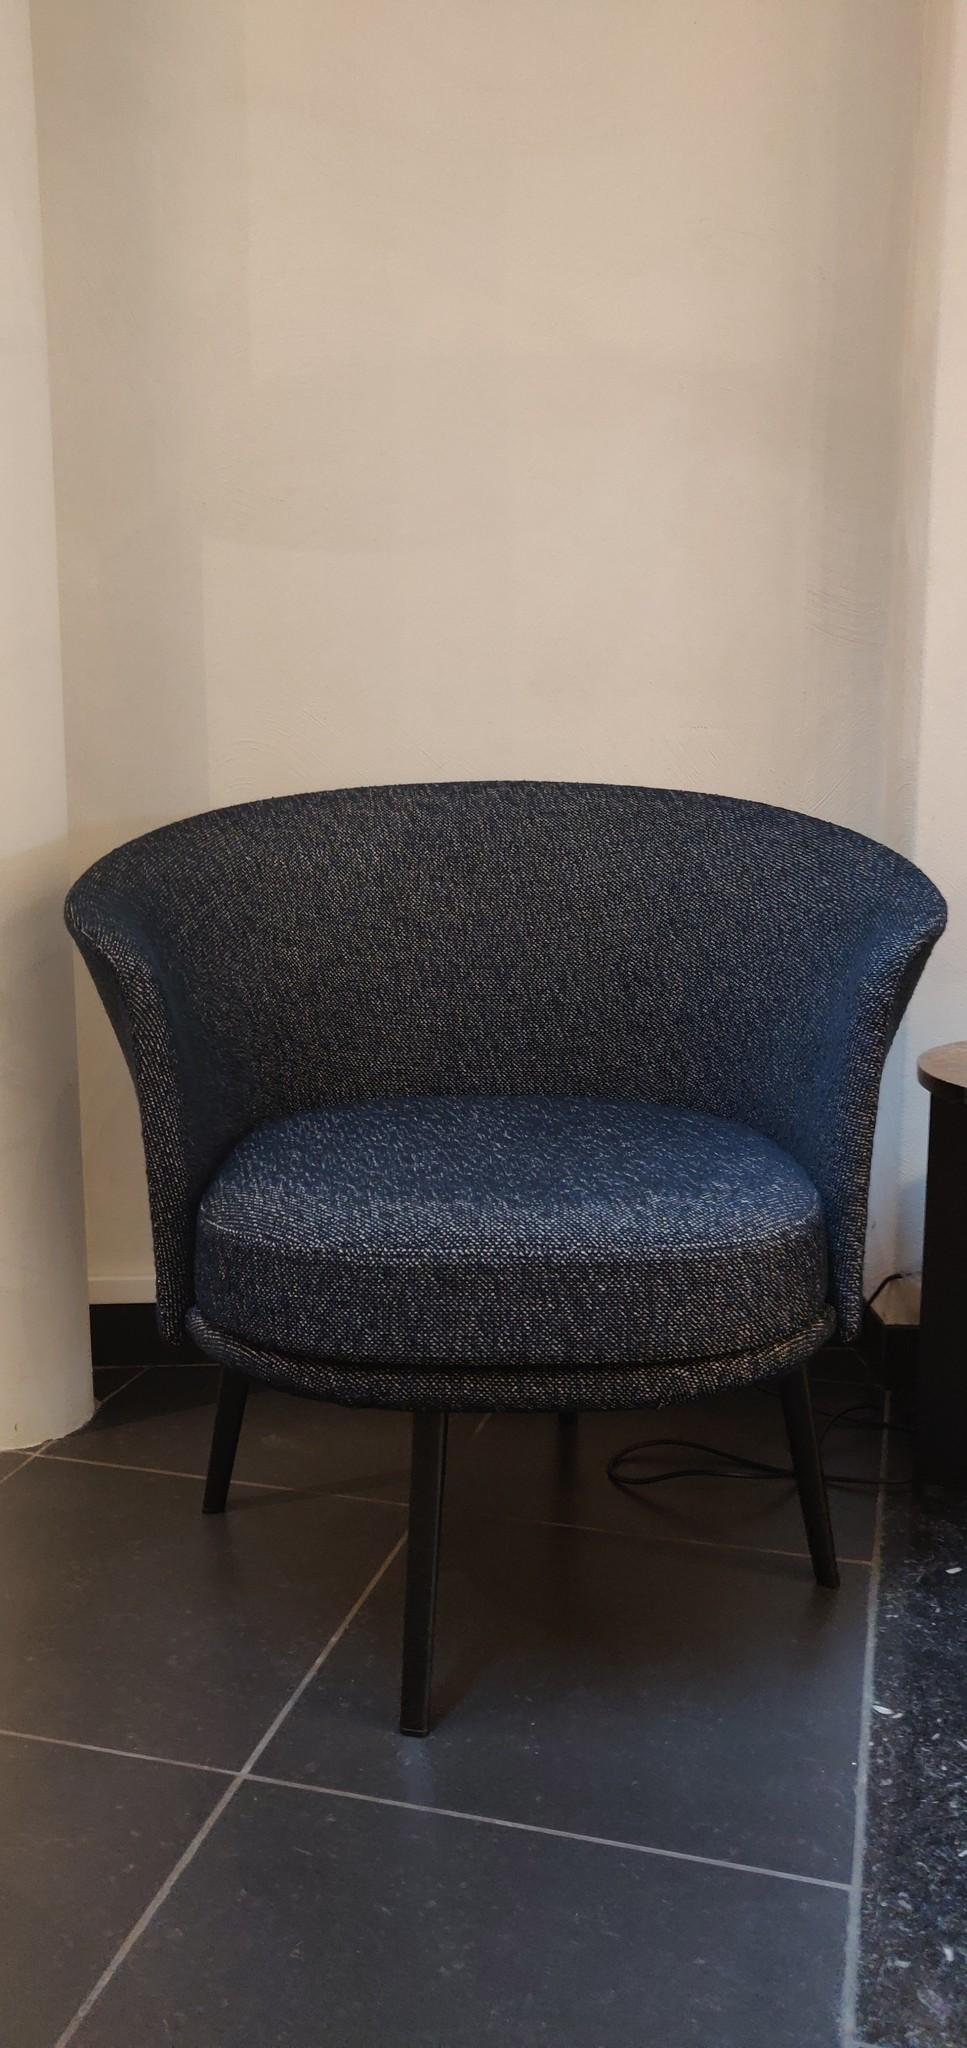 Toonzaalmodel Dorso BLACK POWDER COATED STEEL - FAIRWAY DARK BLUE 308-288-2